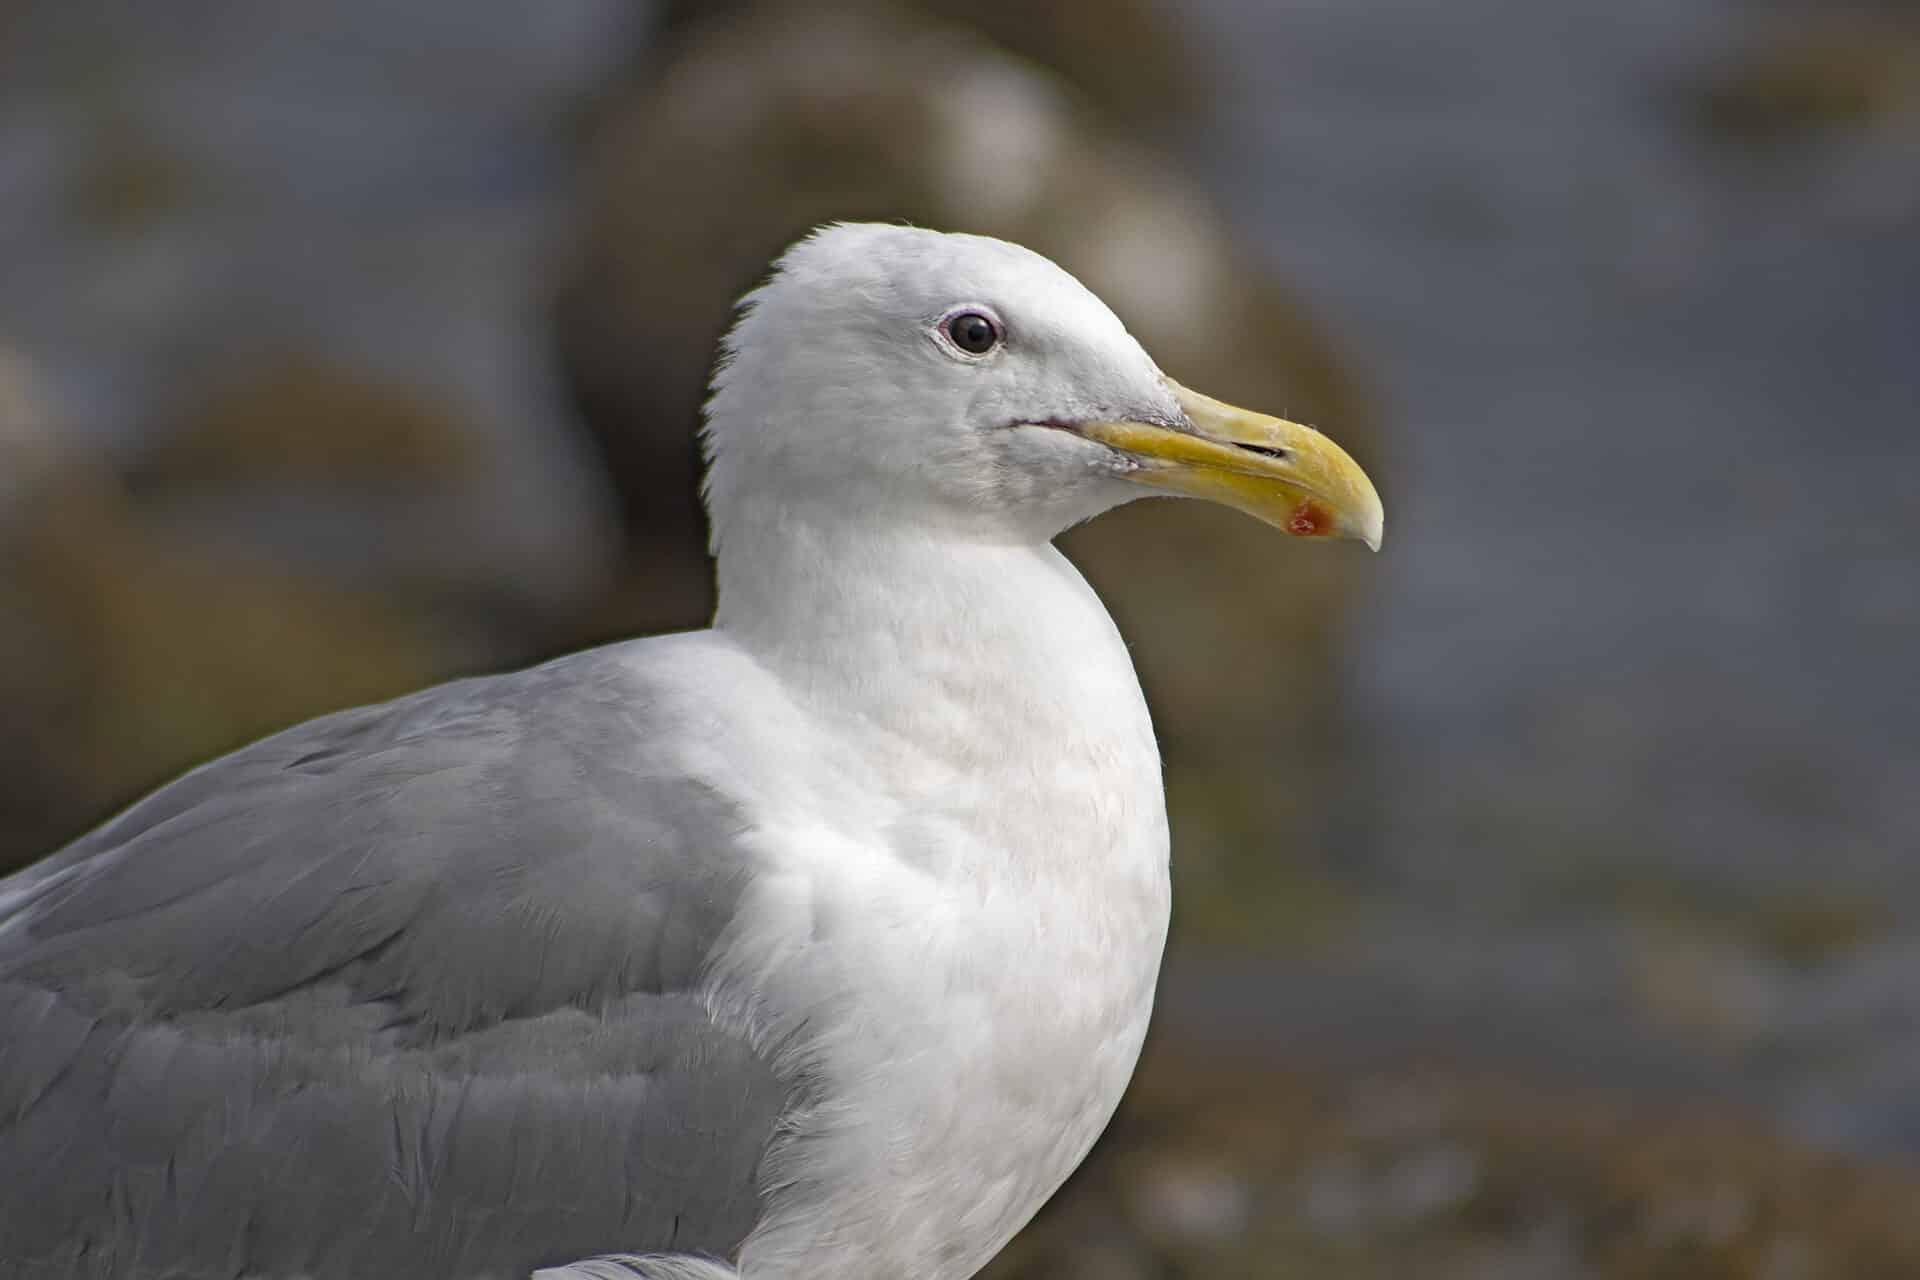 Seagull, August 15, 2021